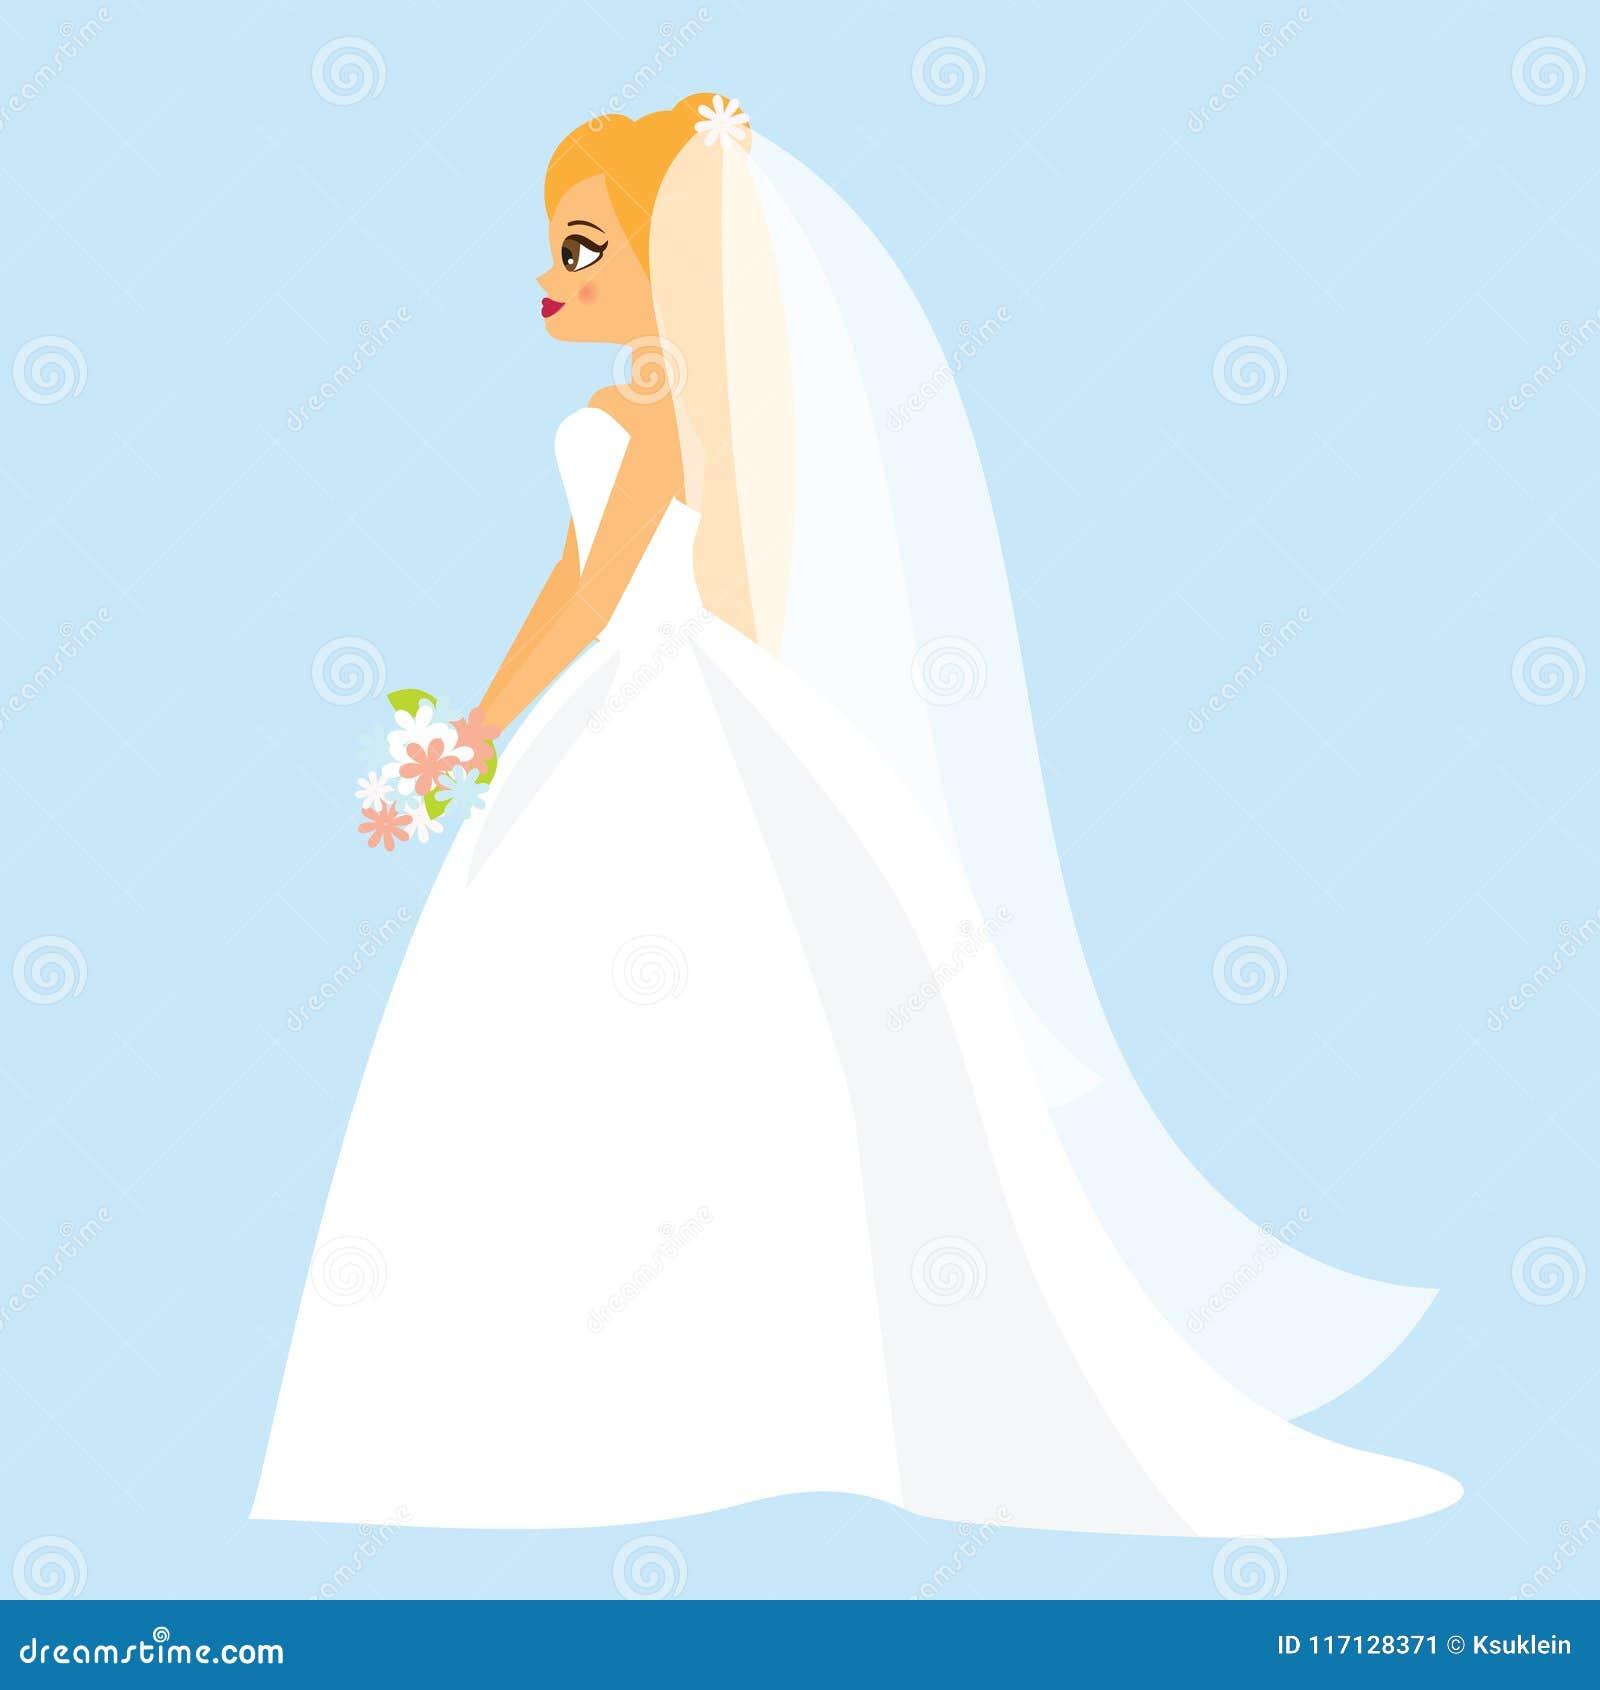 Cartoon Bride Happy Female In Fashionable Wedding Dress Stock